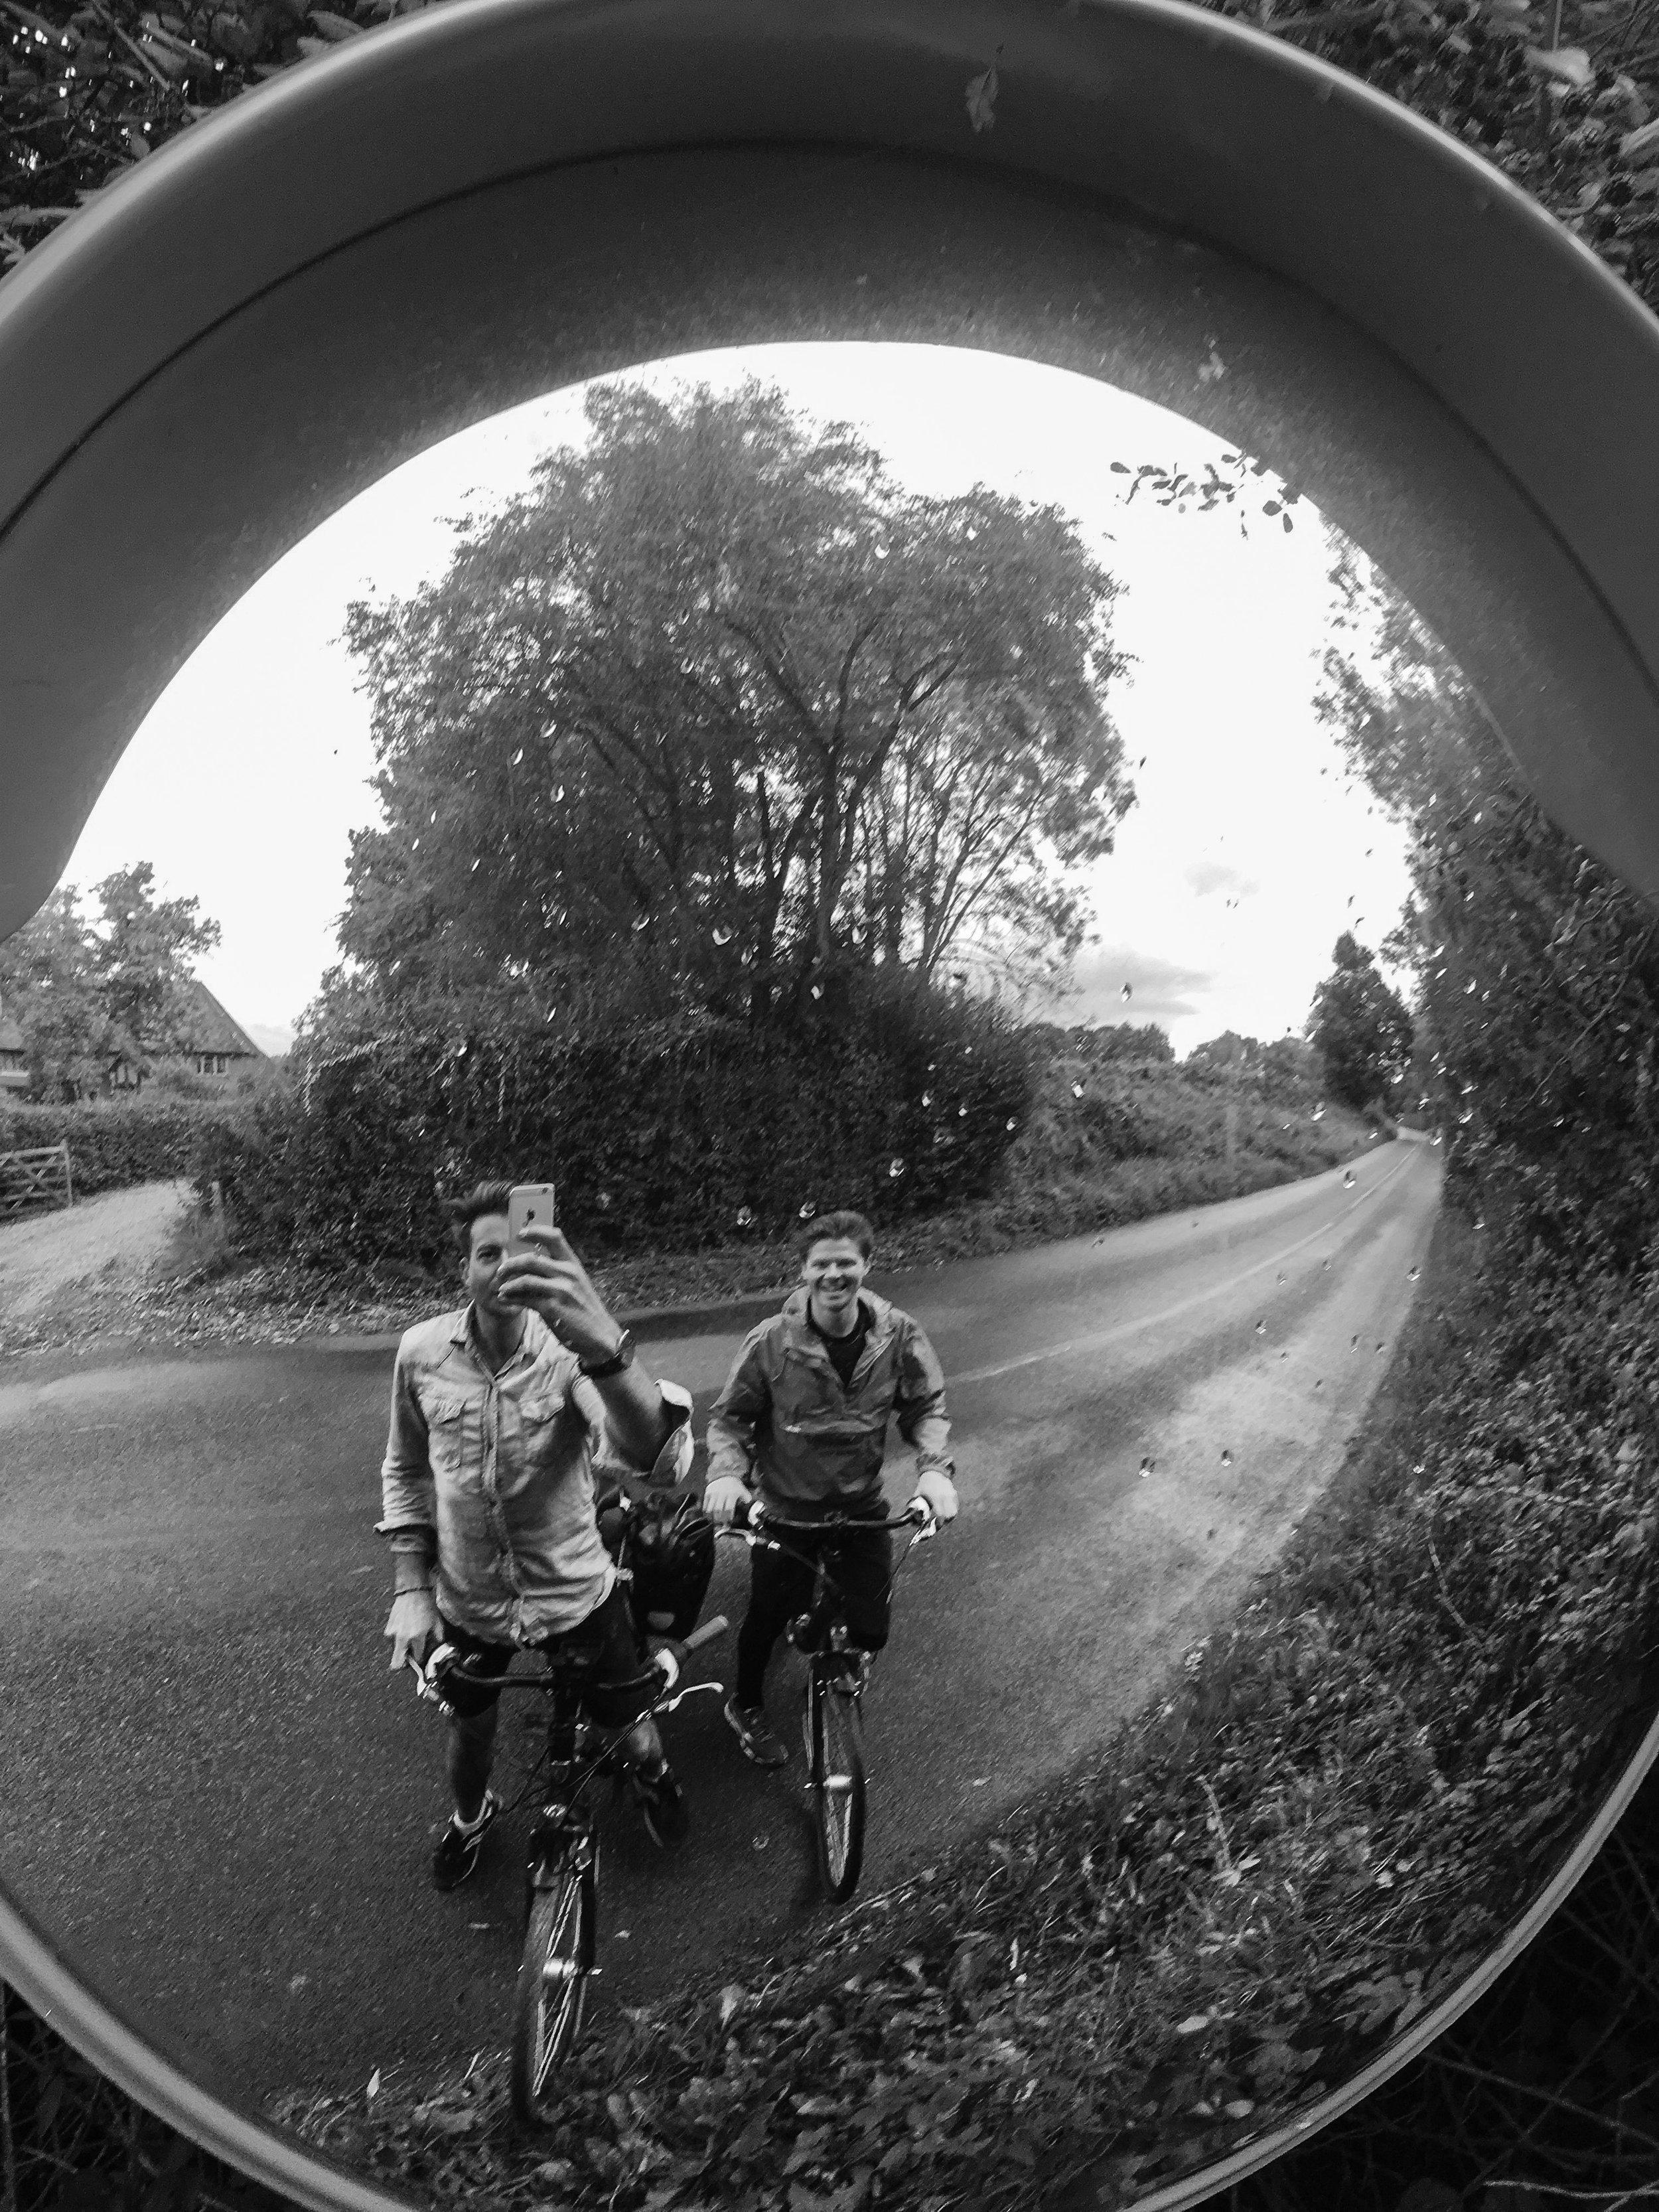 Tom_Oliver_Payne_London_to_Paris_Cycle-4.jpg